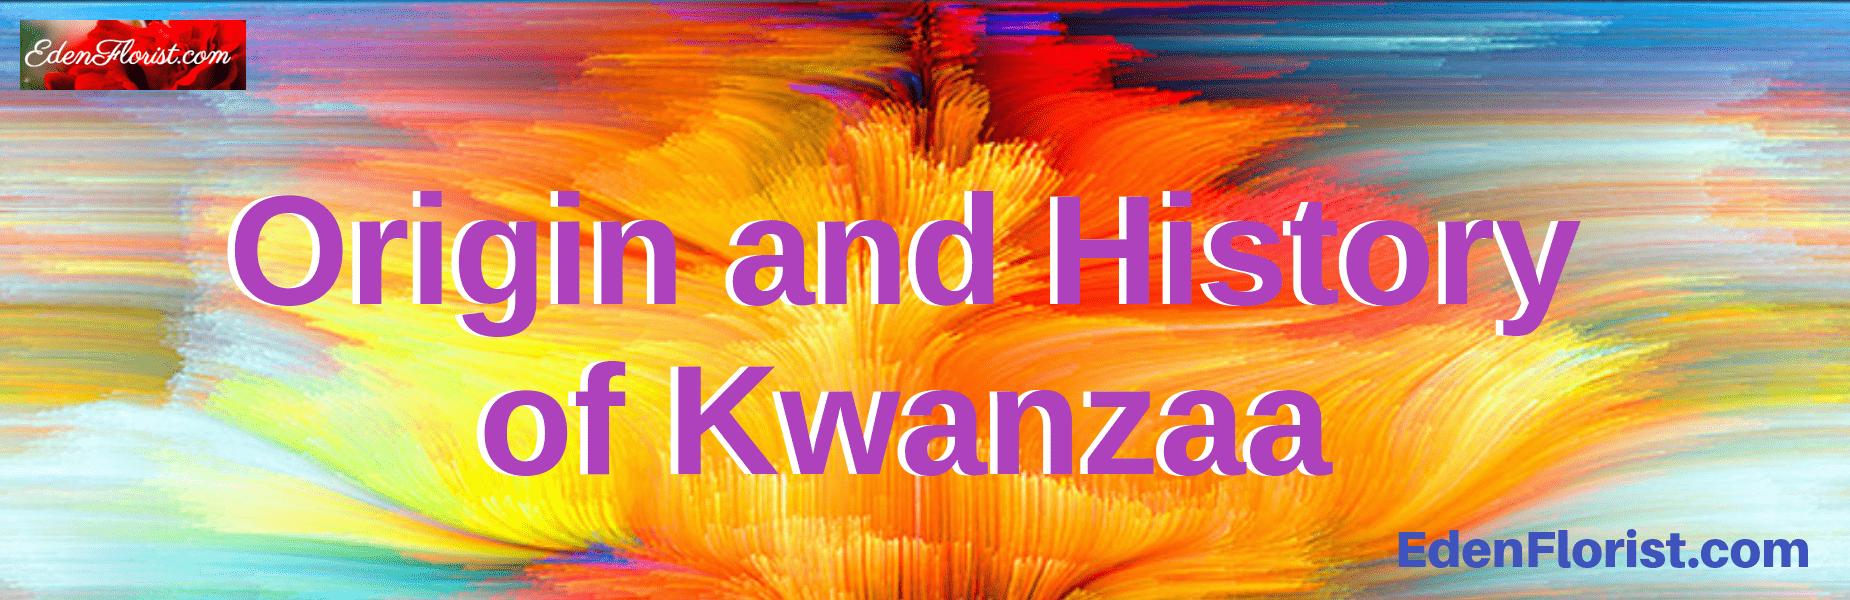 Origin and History of Kwanzaa